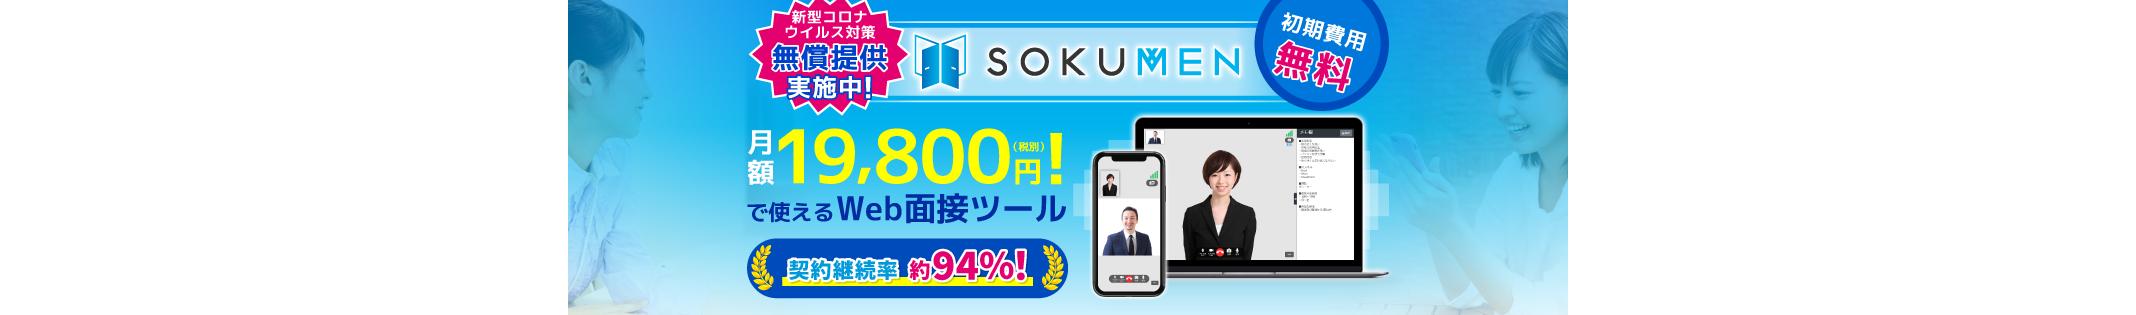 Web面接ツール「SOKUMEN」、「グループ面接機能」が10人まで入室可能に